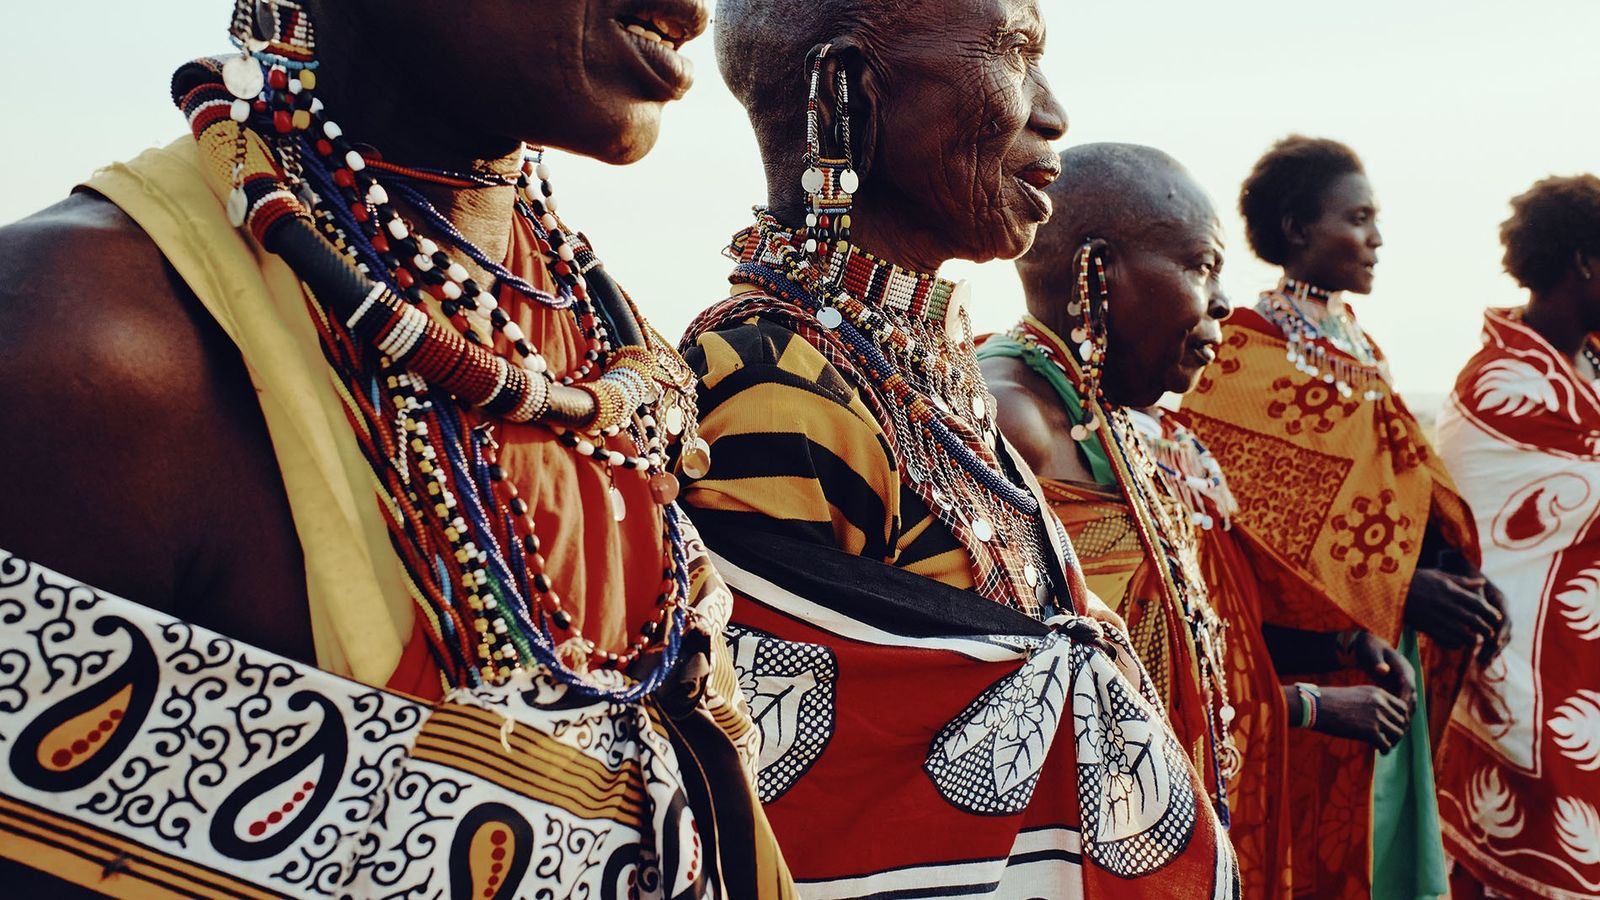 Maasai women sing in the village of Olsere, Naboisho Conservancy.